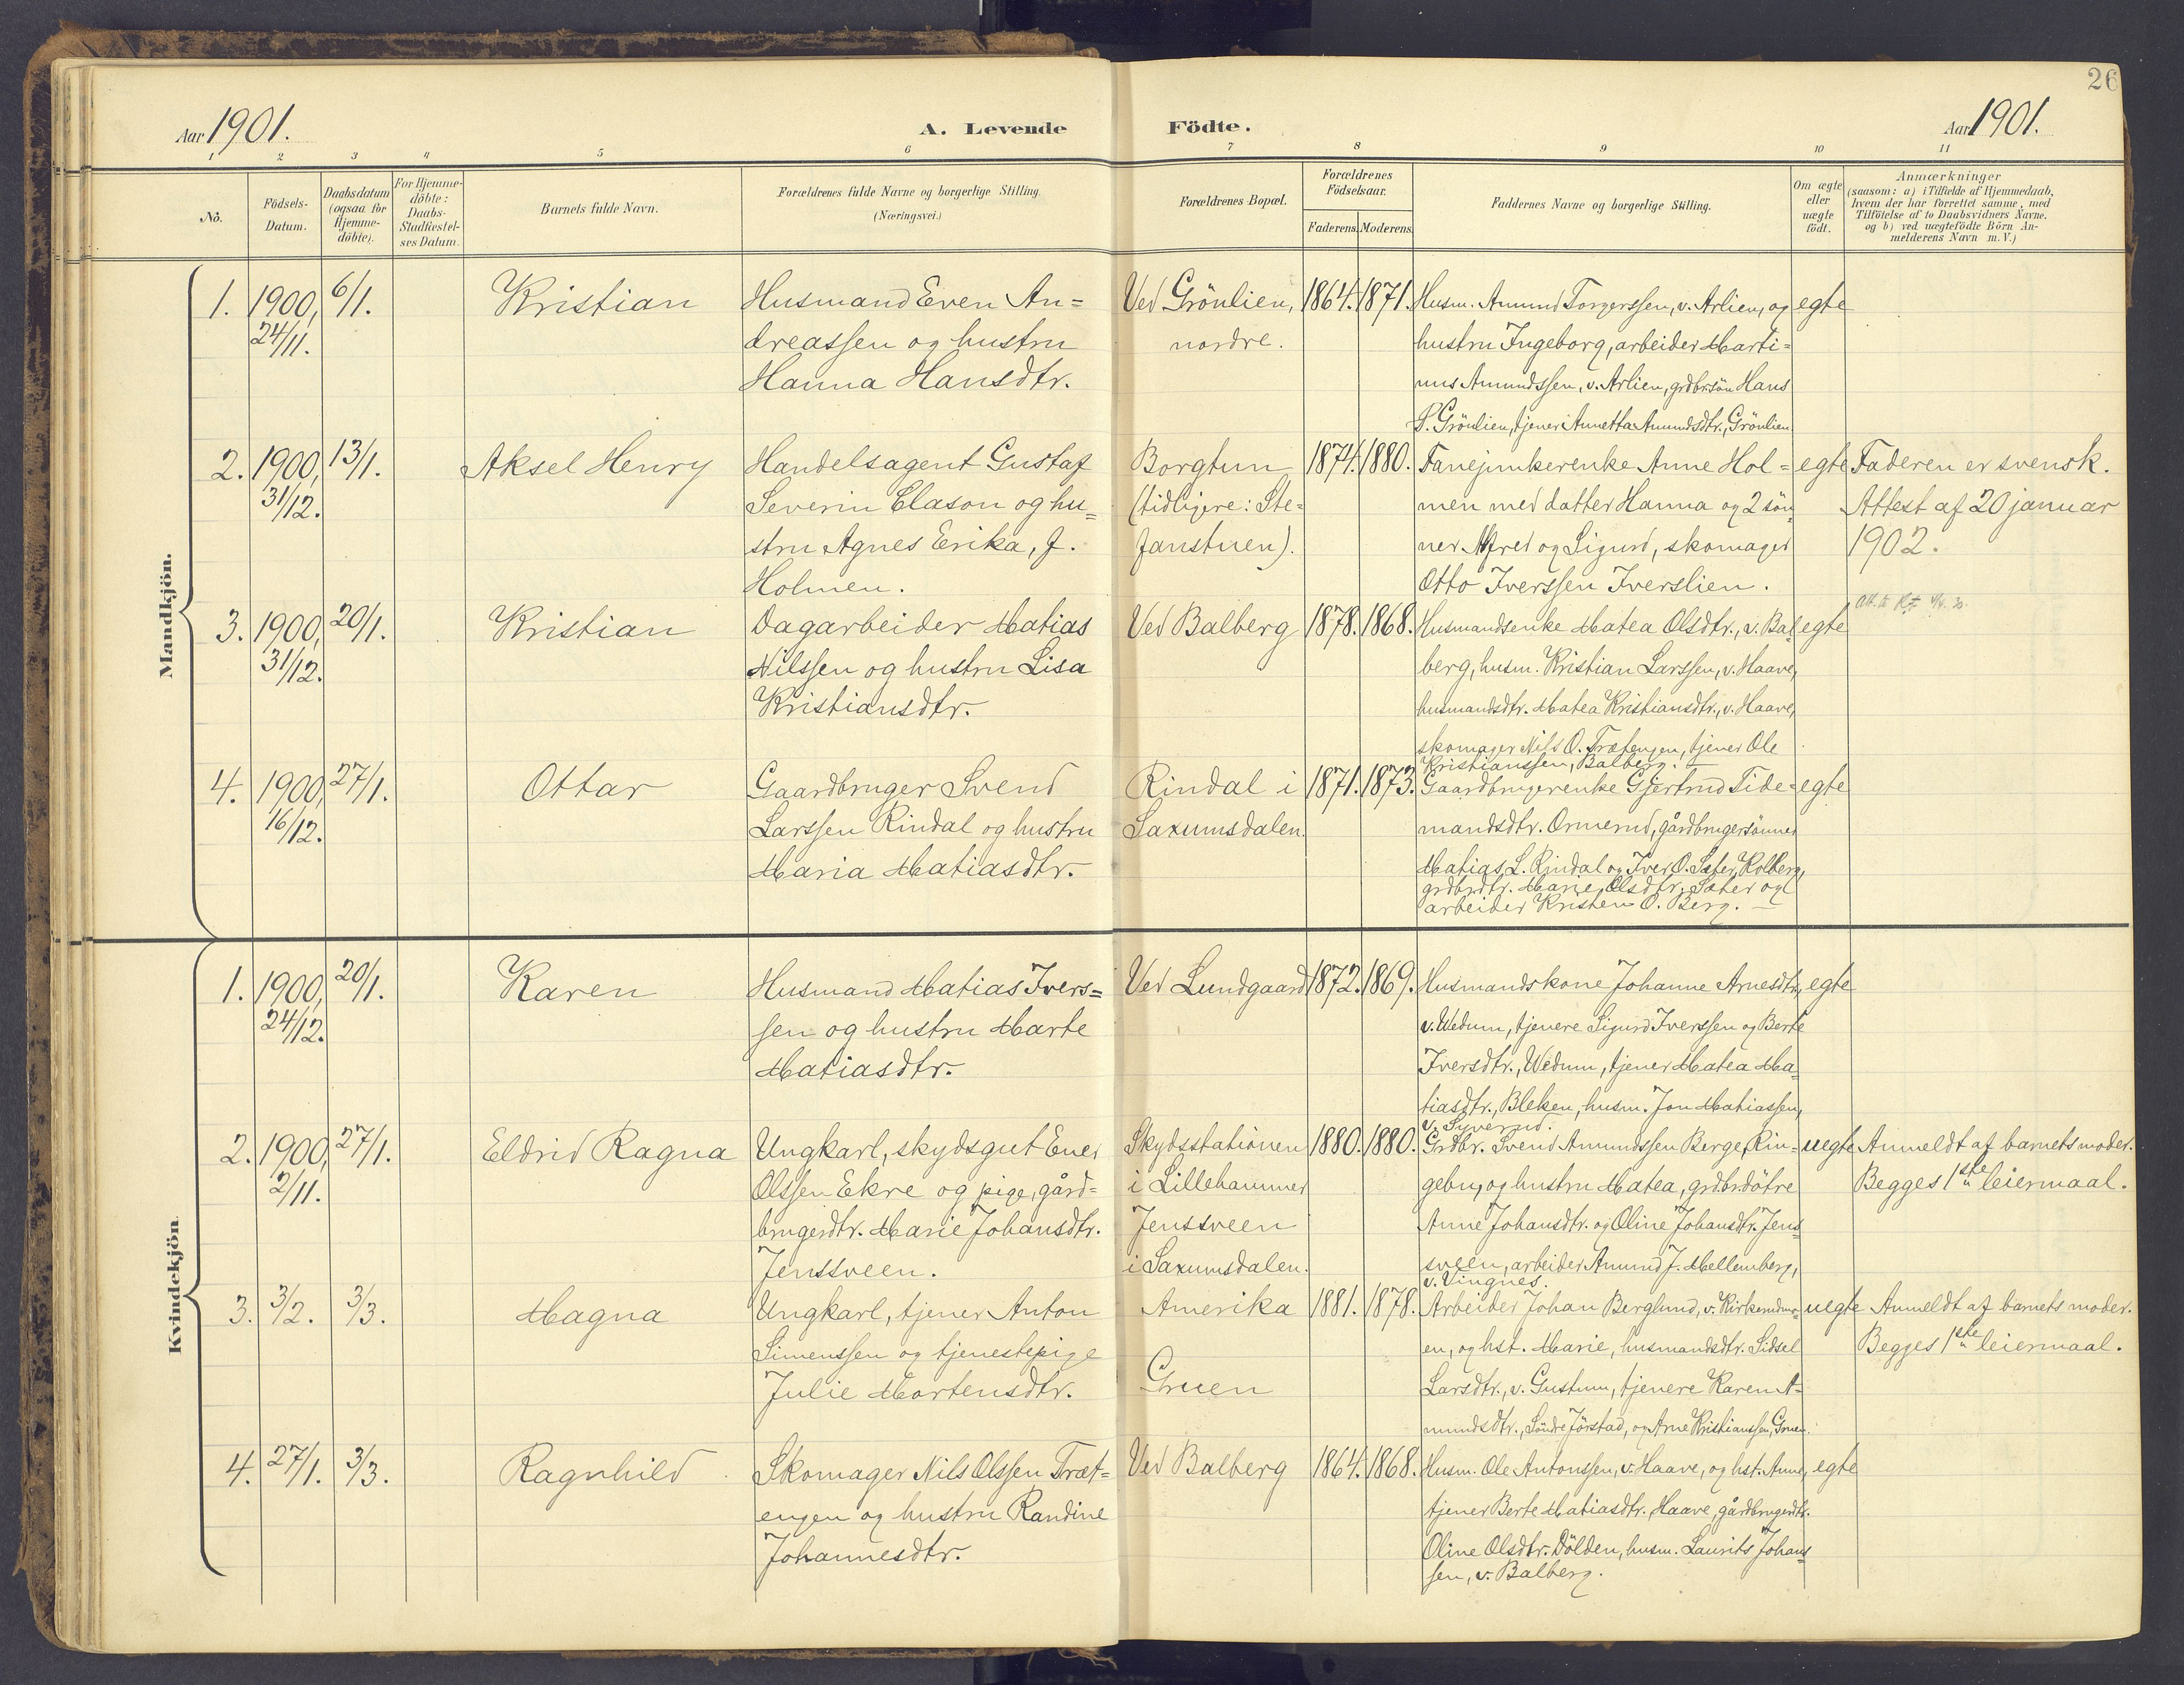 SAH, Fåberg prestekontor, Ministerialbok nr. 12, 1899-1915, s. 26